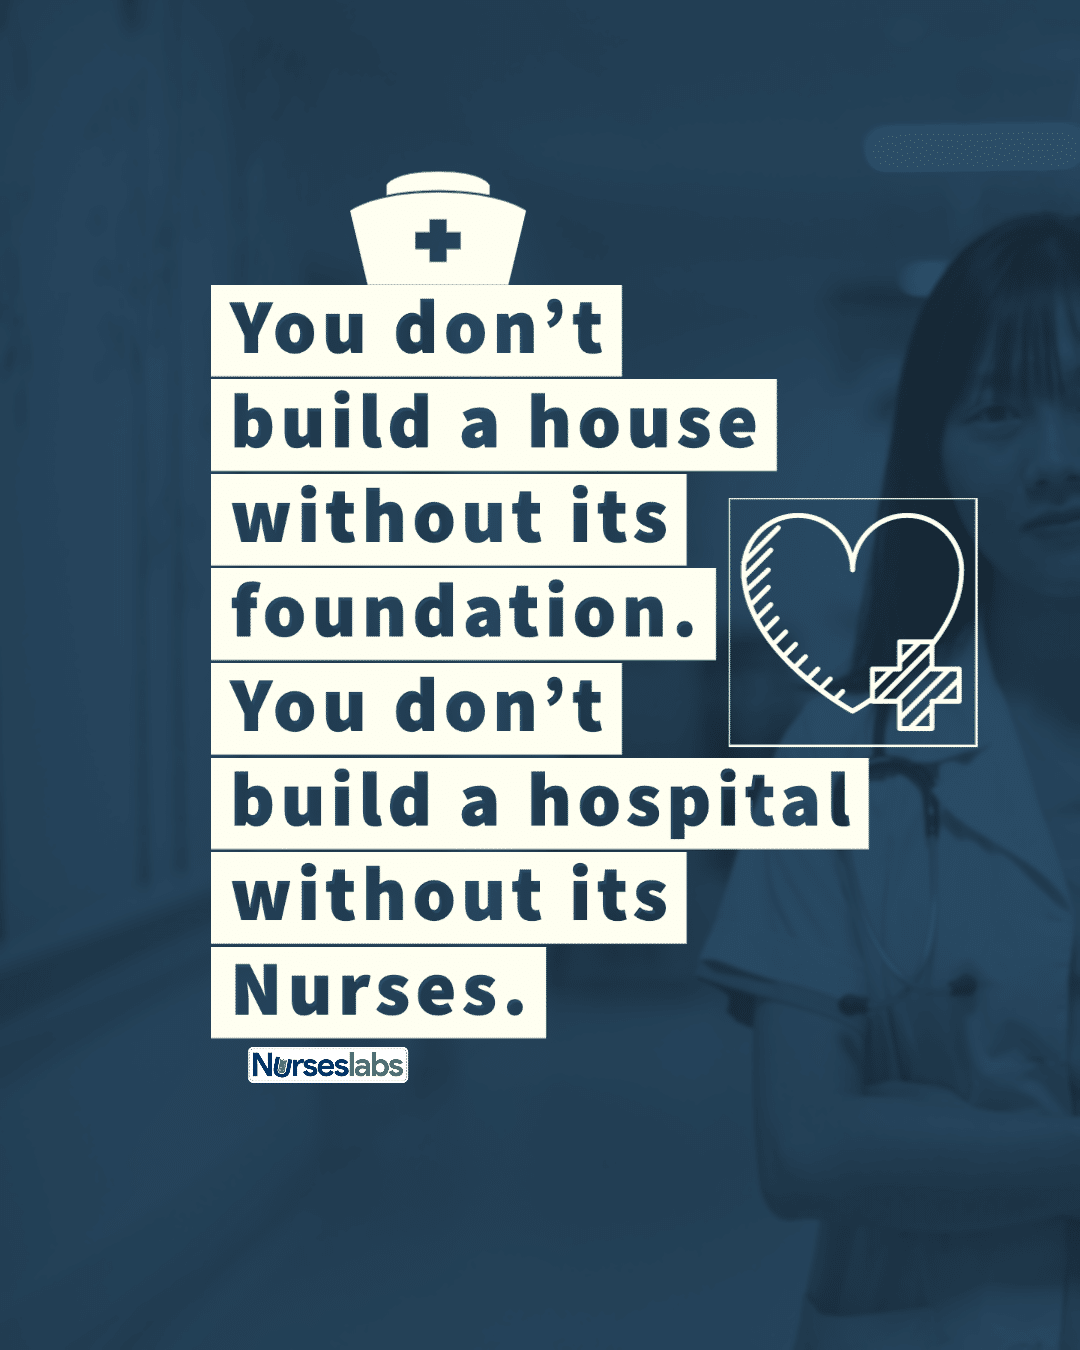 80 Nurse Quotes to Inspire, Motivate, and Humor Nurses - Nurseslabs